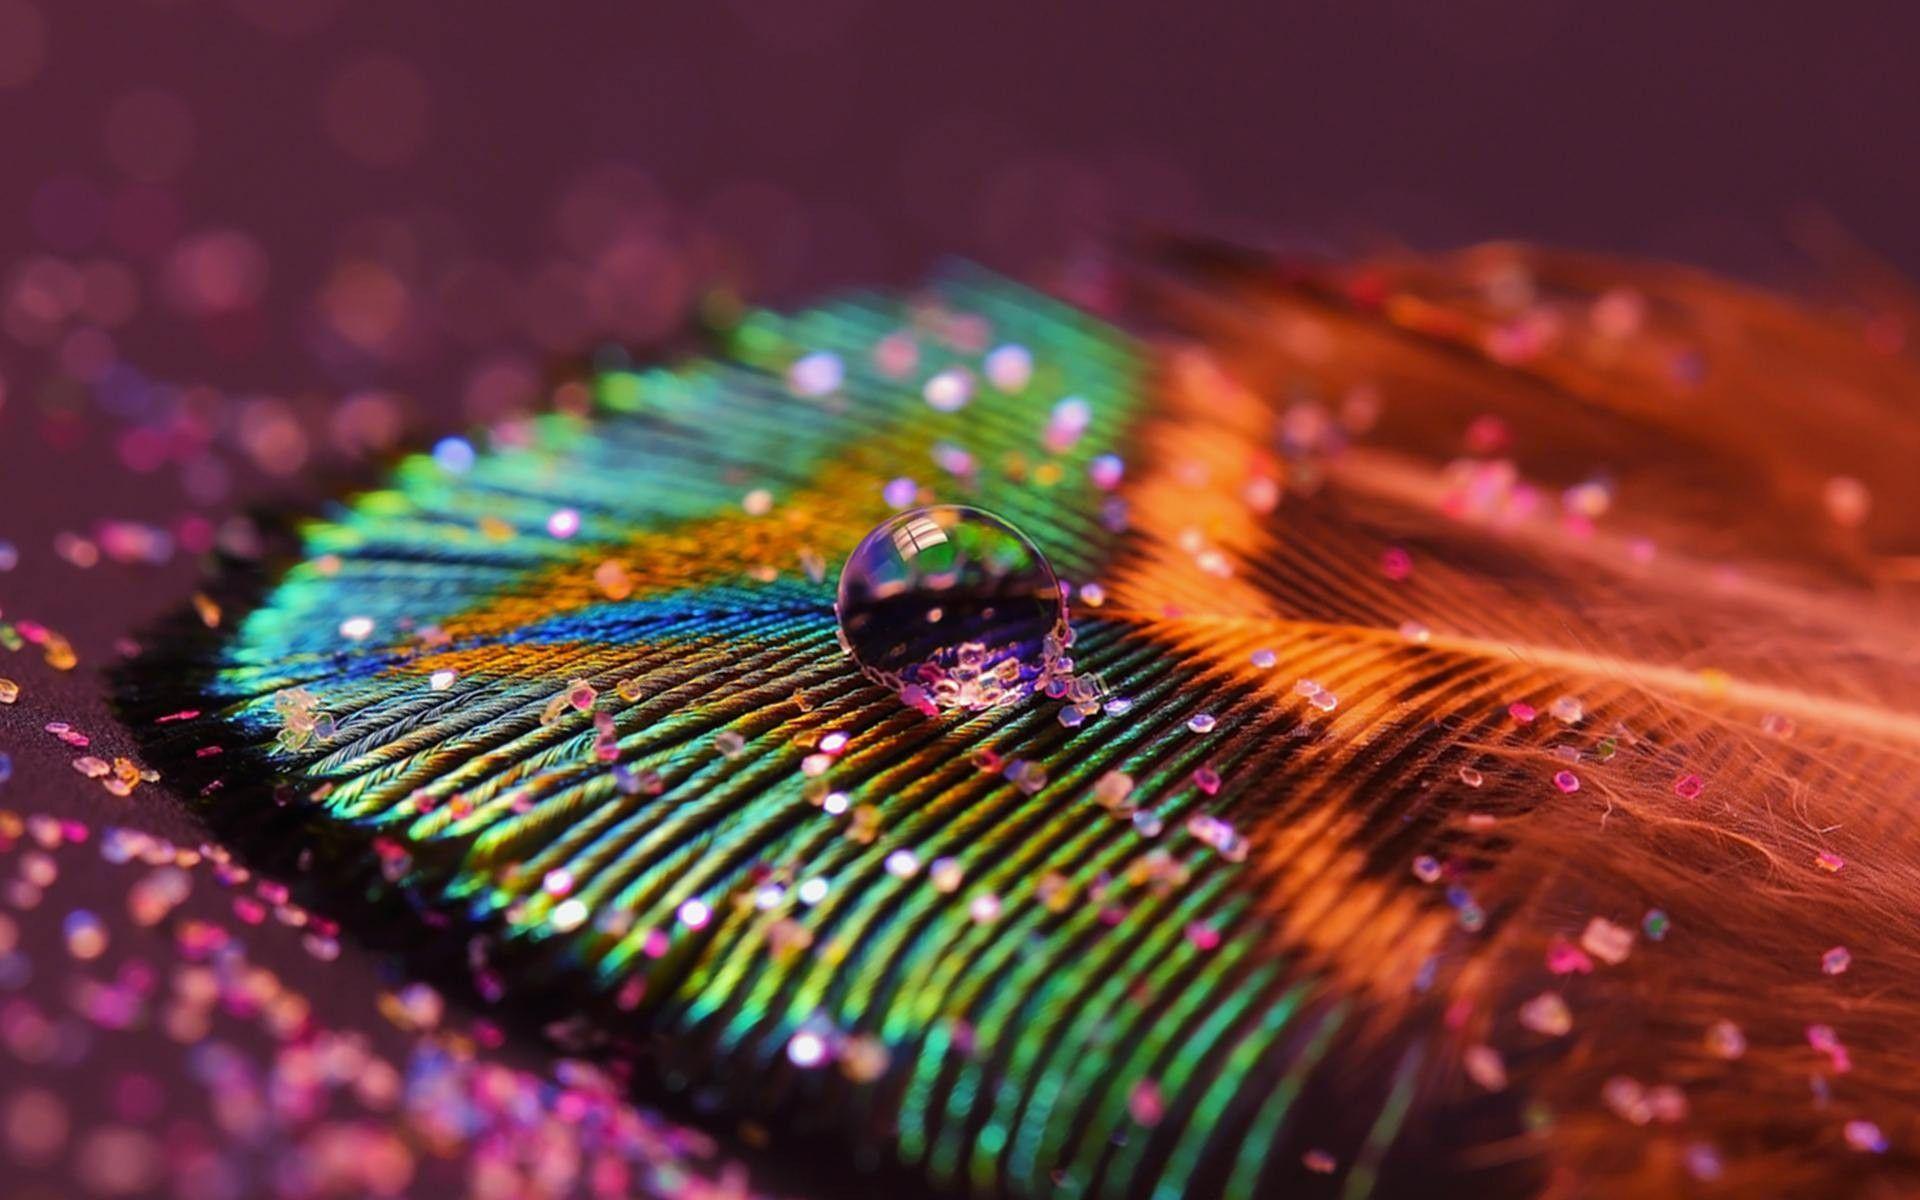 peacock photography